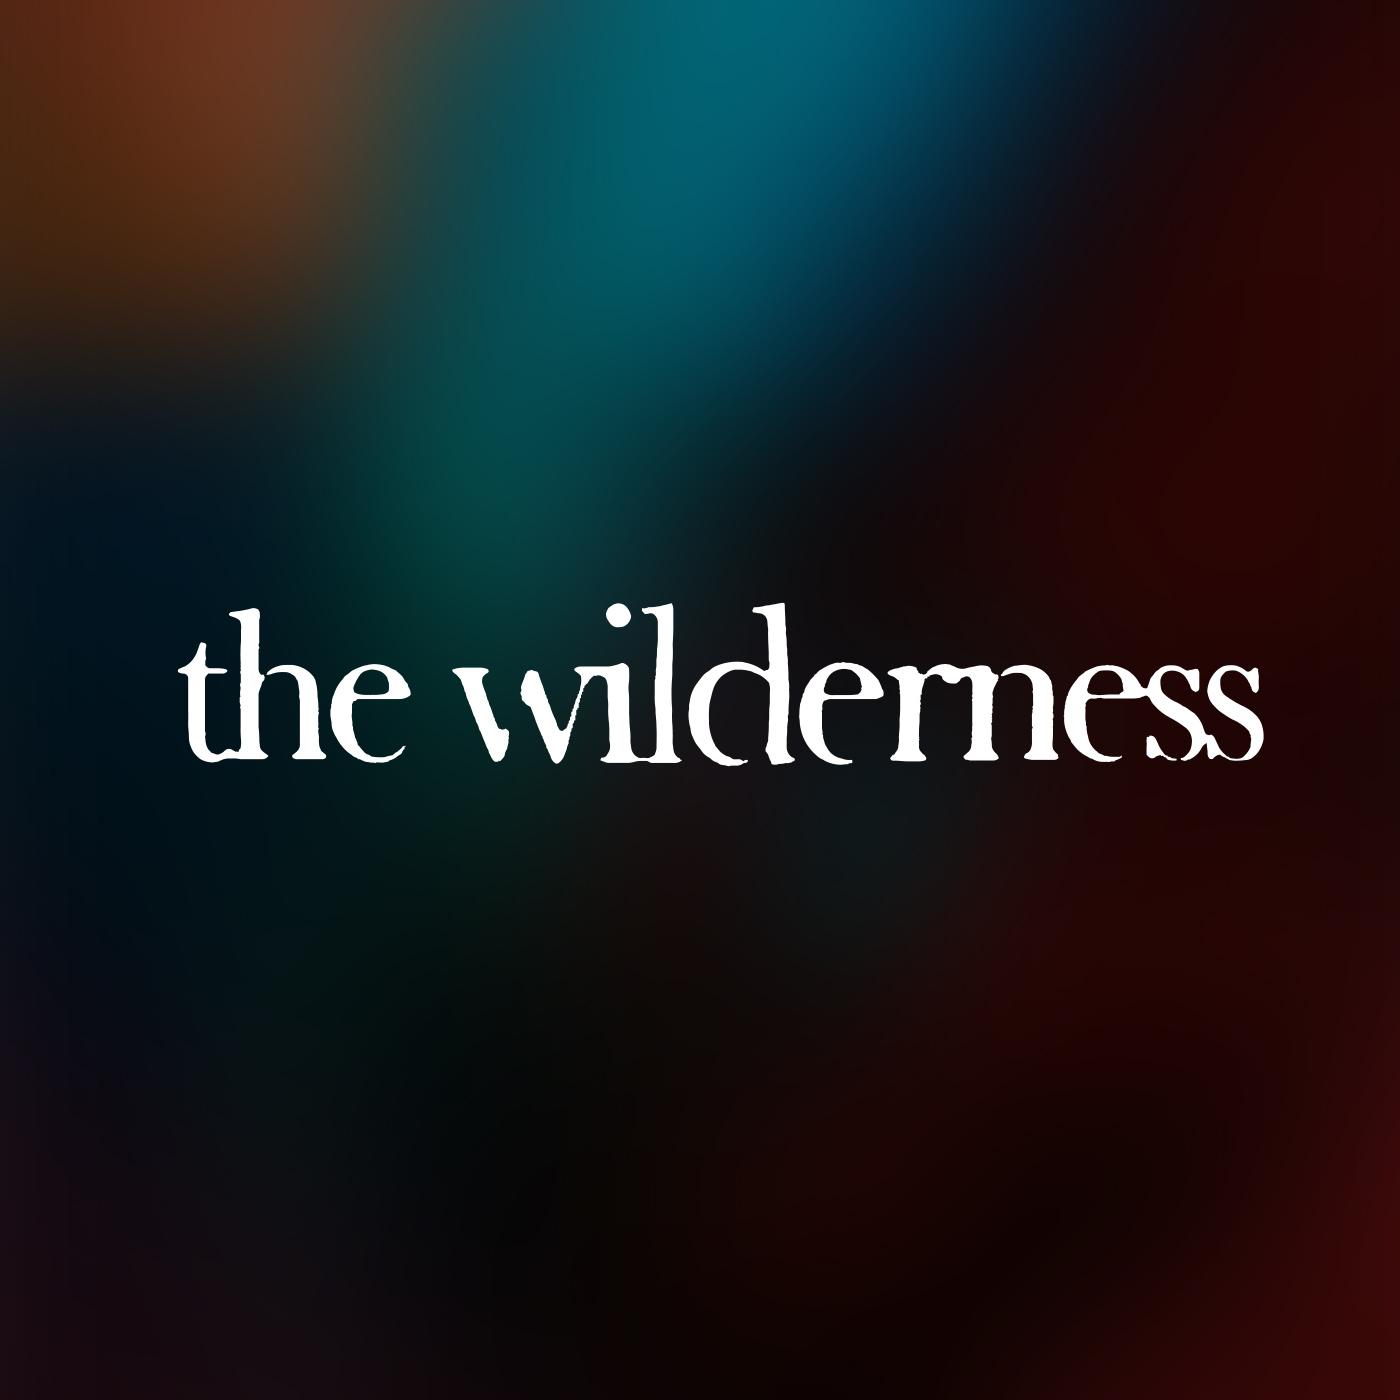 The wilderness logo